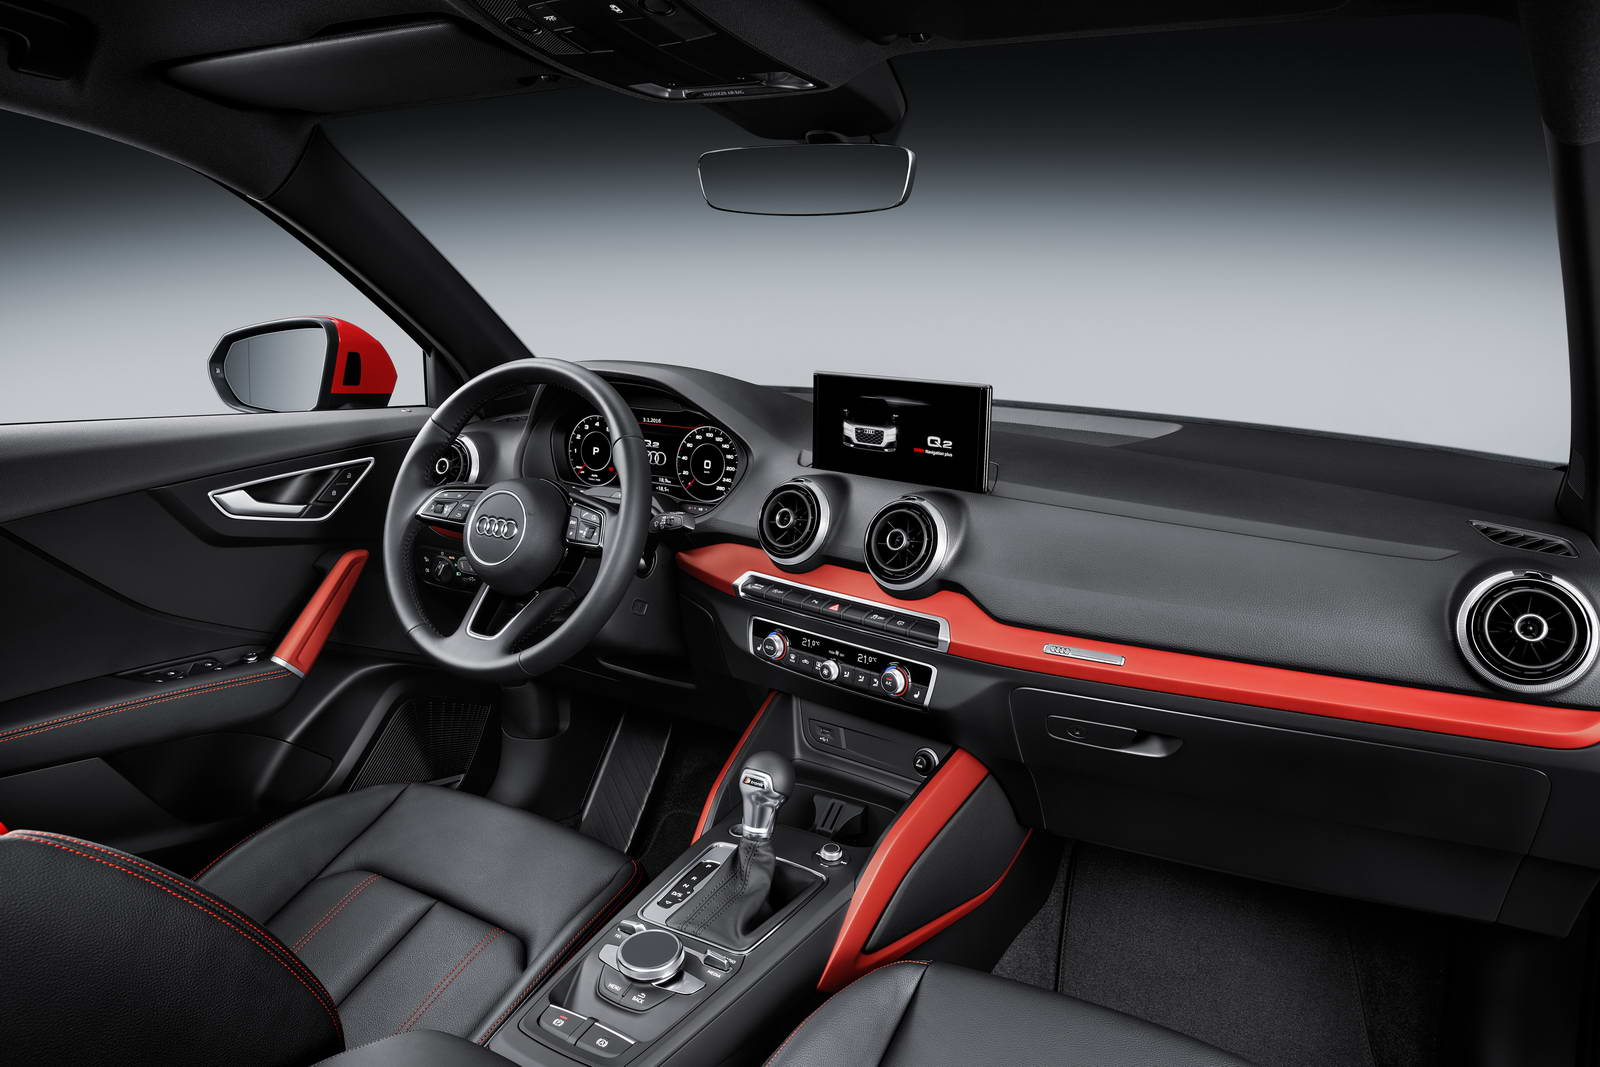 Nuova-Audi-q2-2017-crossover-9